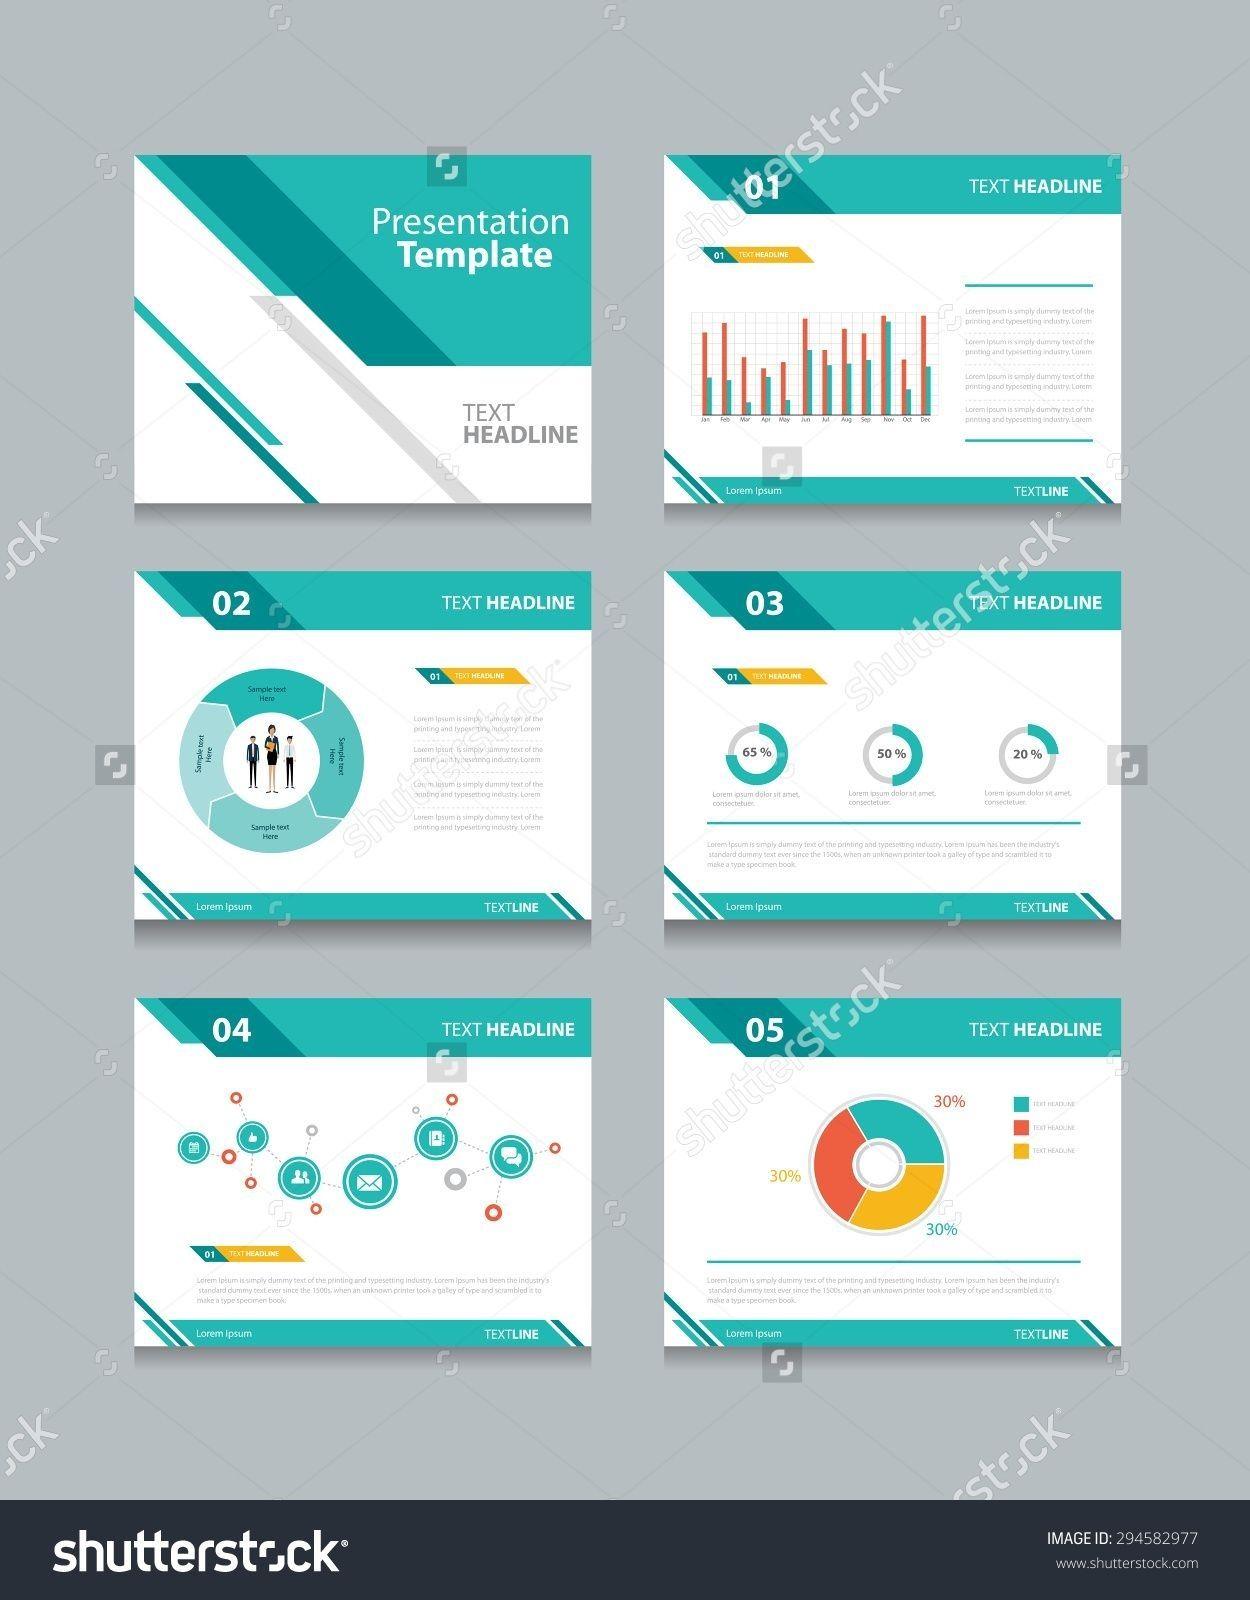 Business Presentation Template Set Powerpoint Template Design In Business Template Design For Powerpoint22728 Kartu Kertas Kreatif Kartu